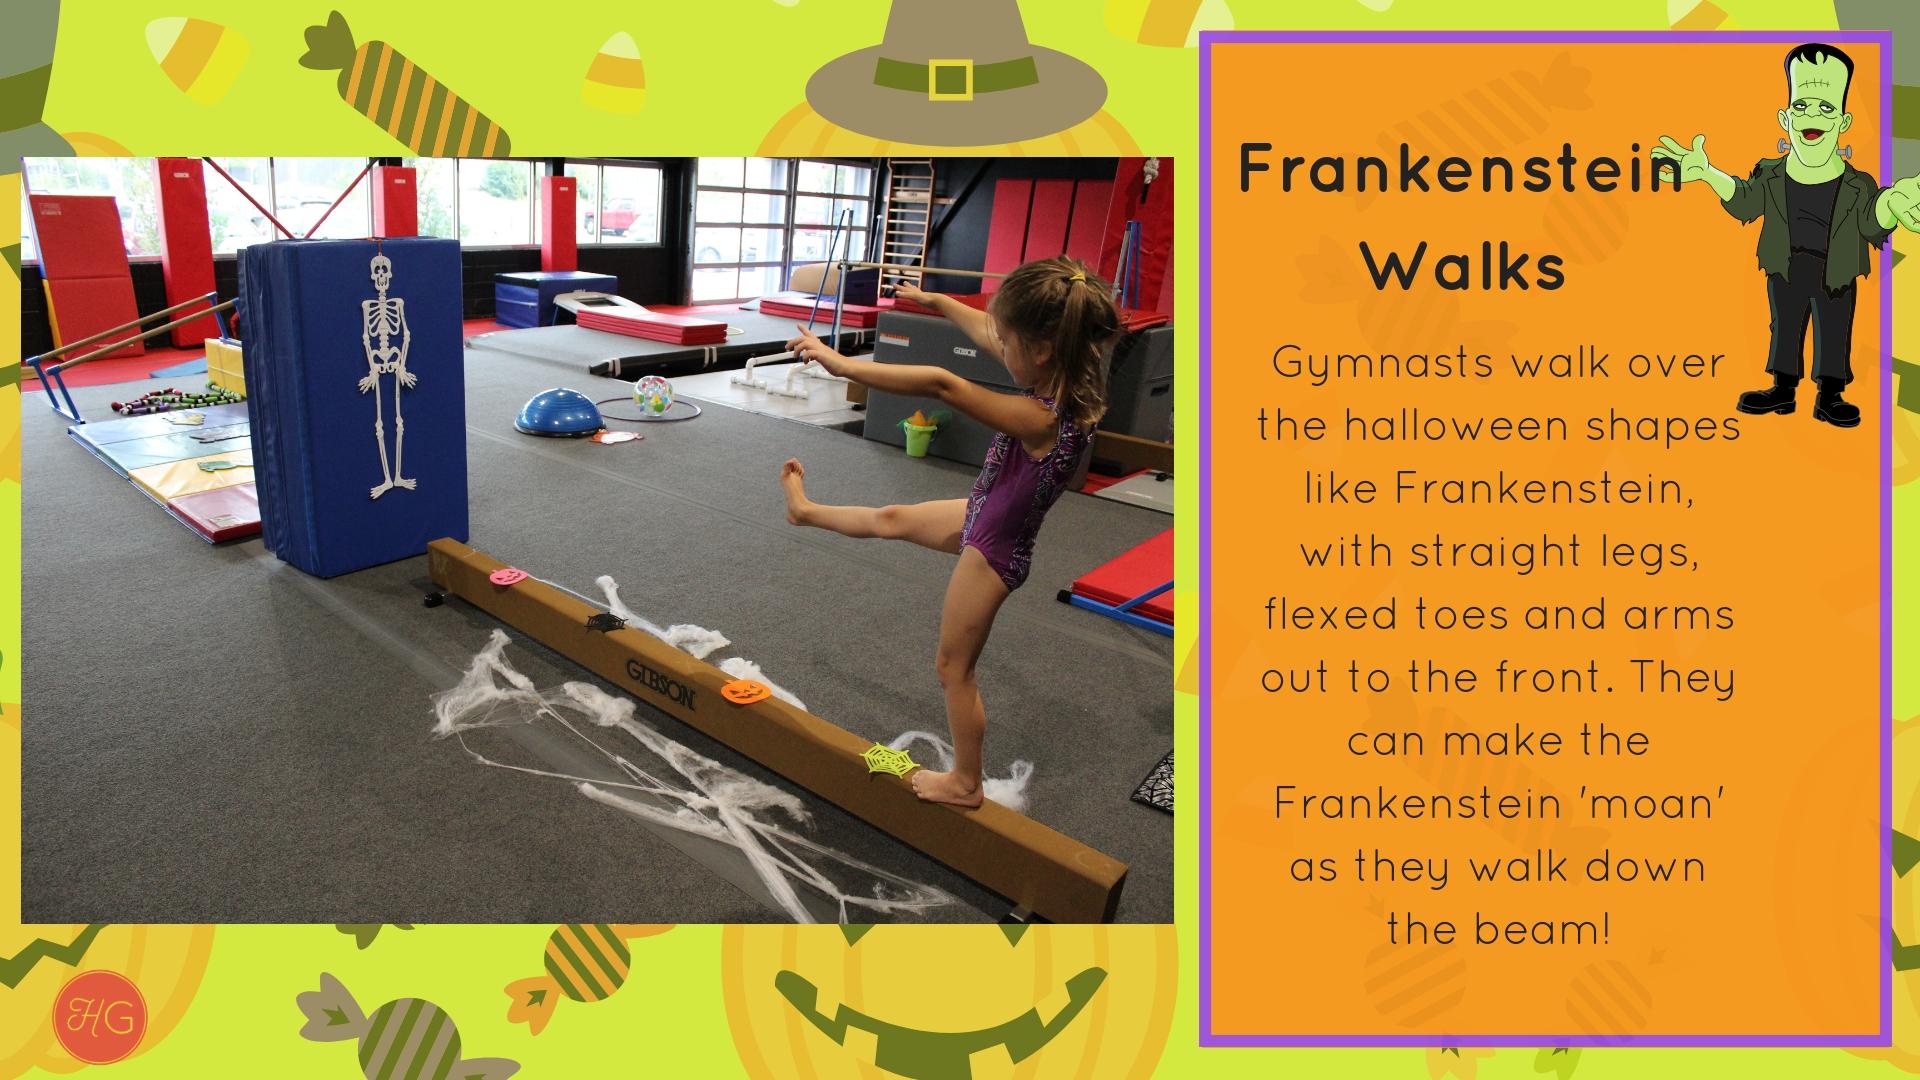 Frankenstein walks blog image.jpg